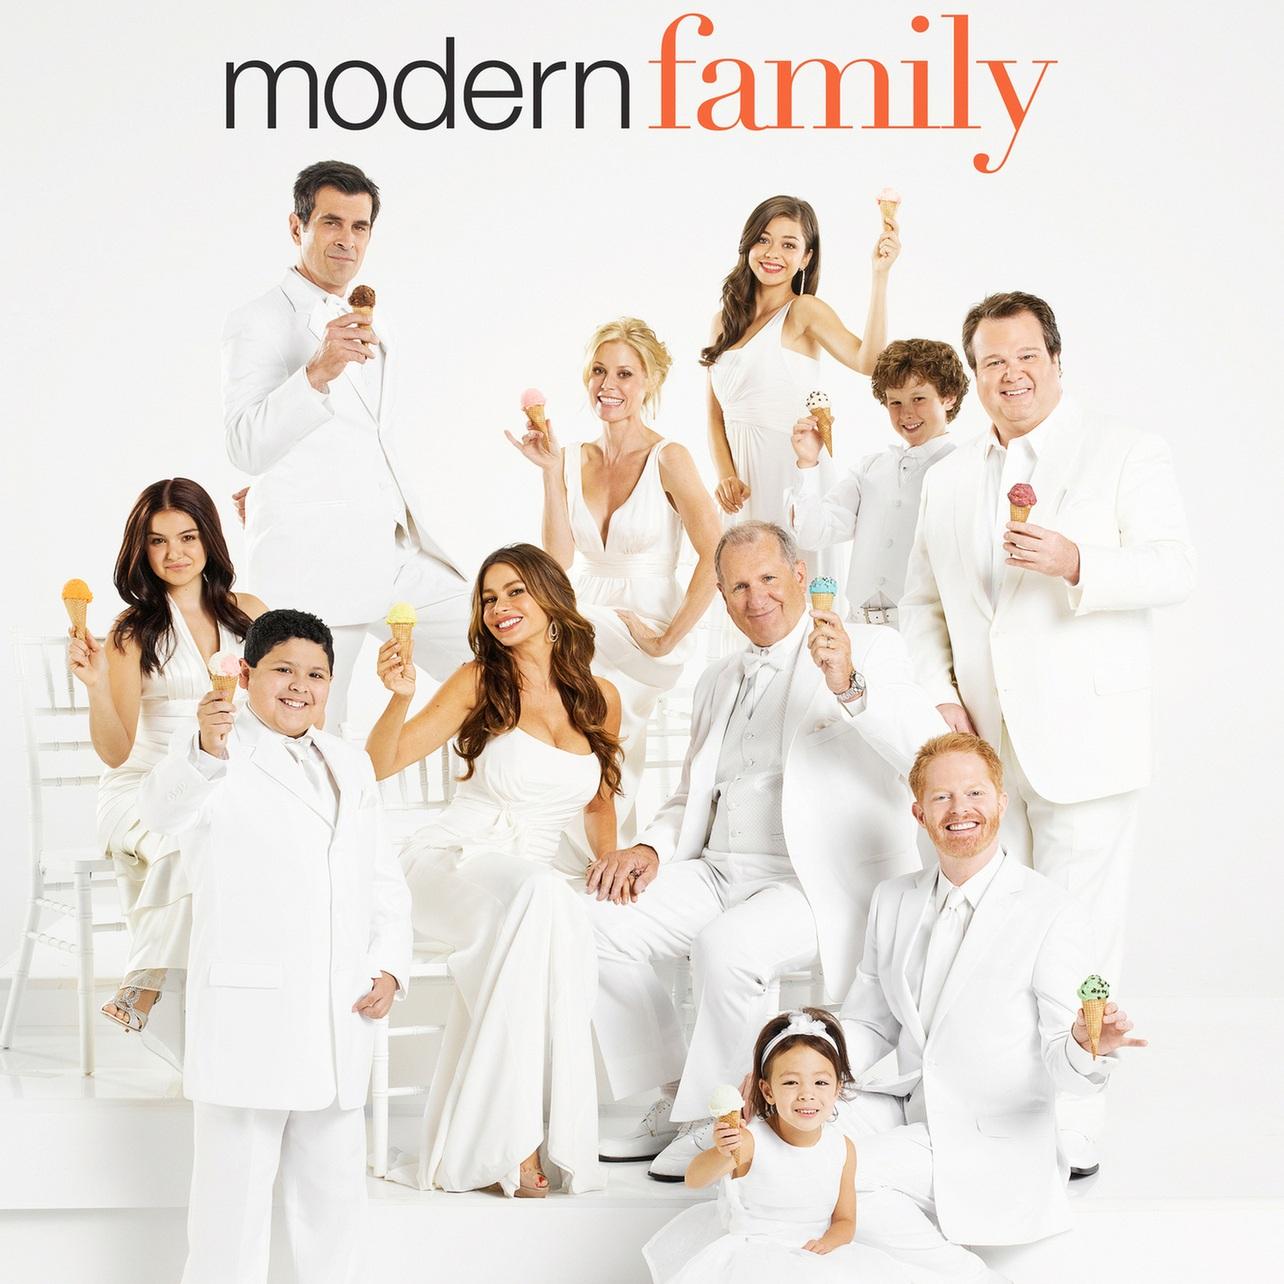 modern family.jpeg